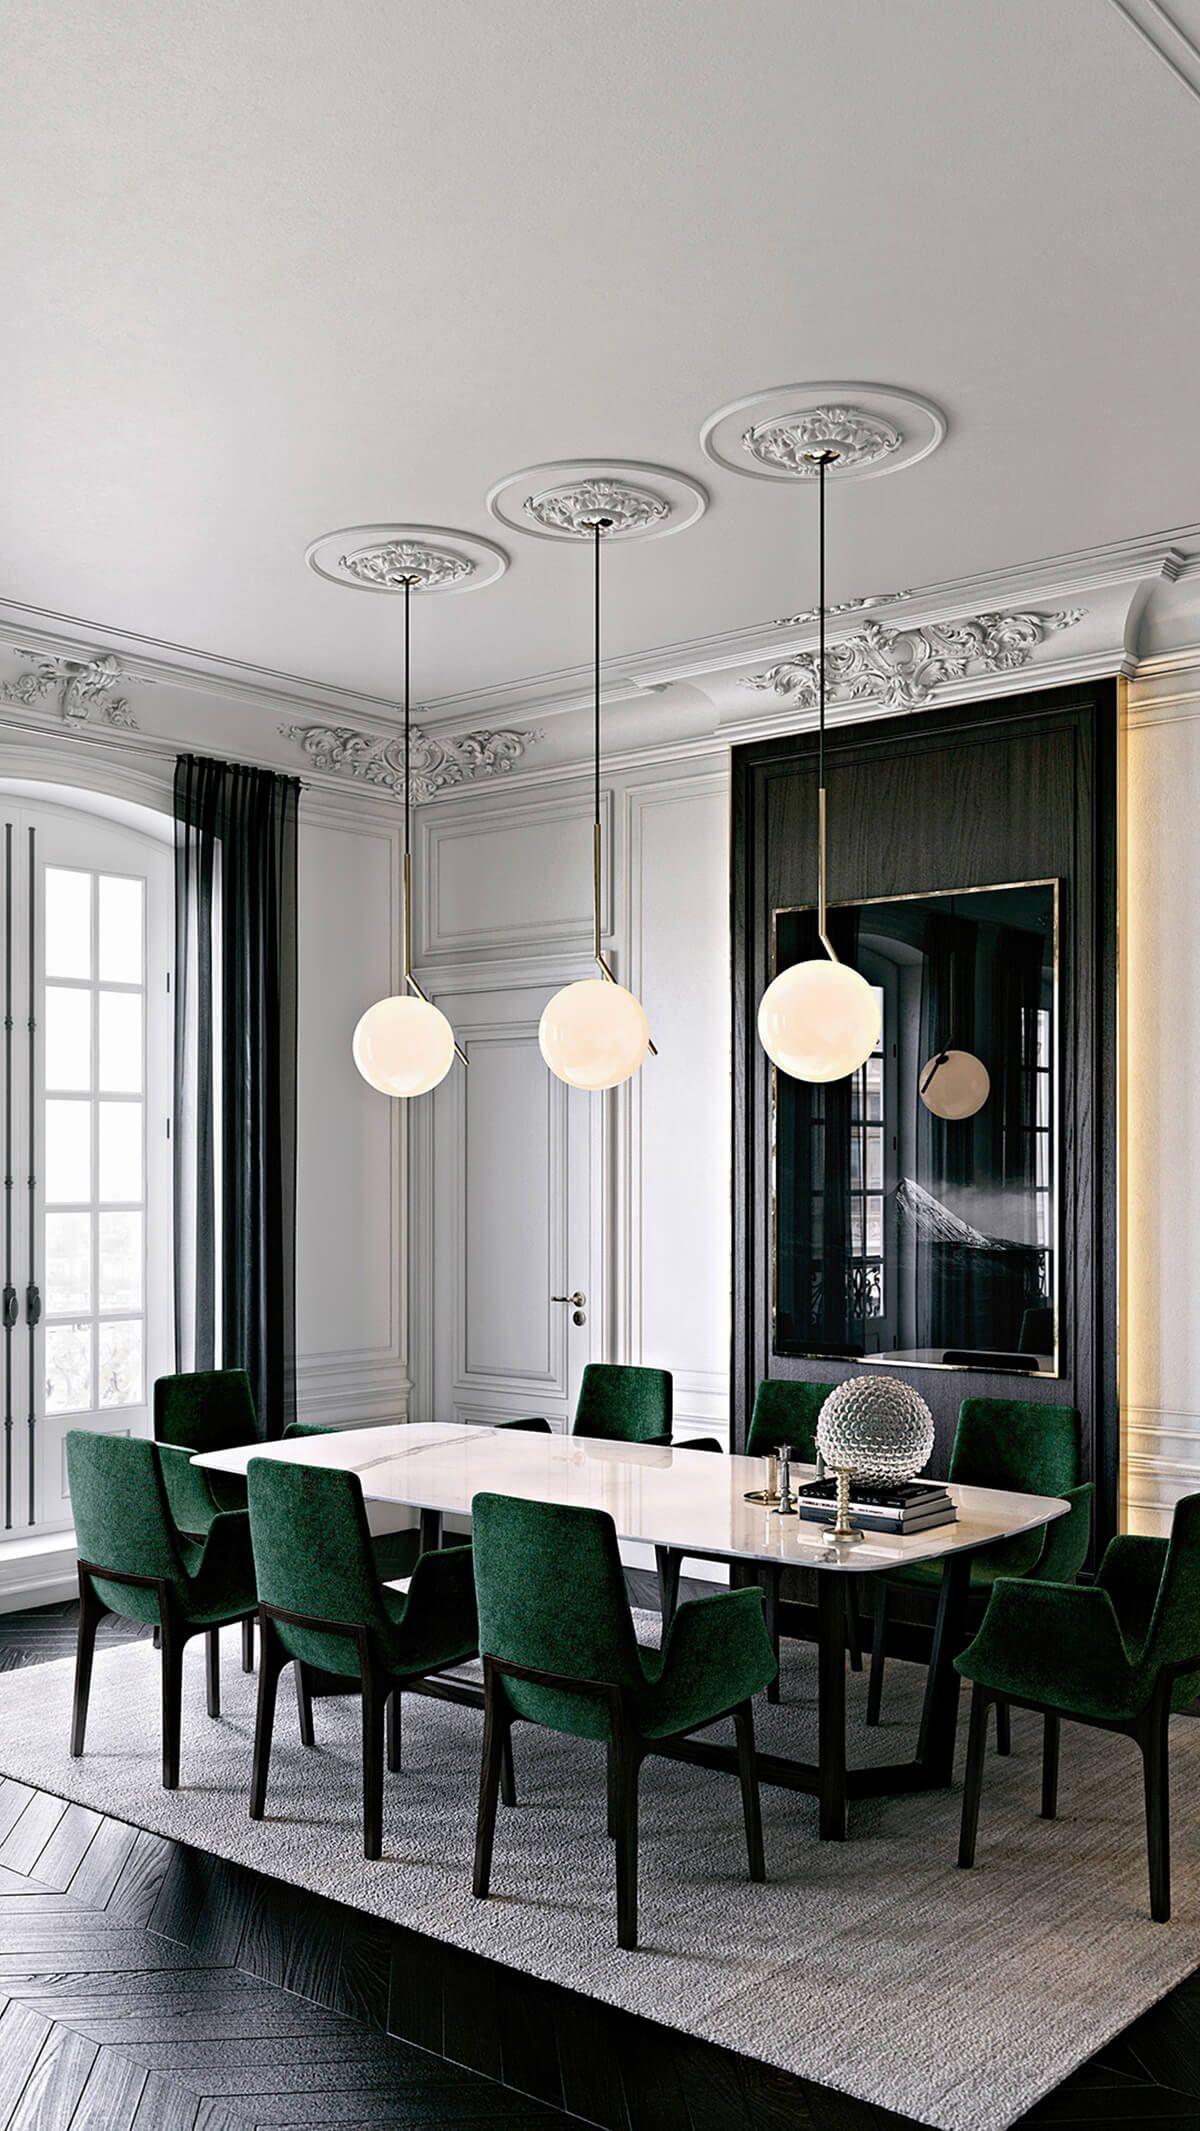 Vert Emeraude Deco Salle A Manger Deco Maison Et